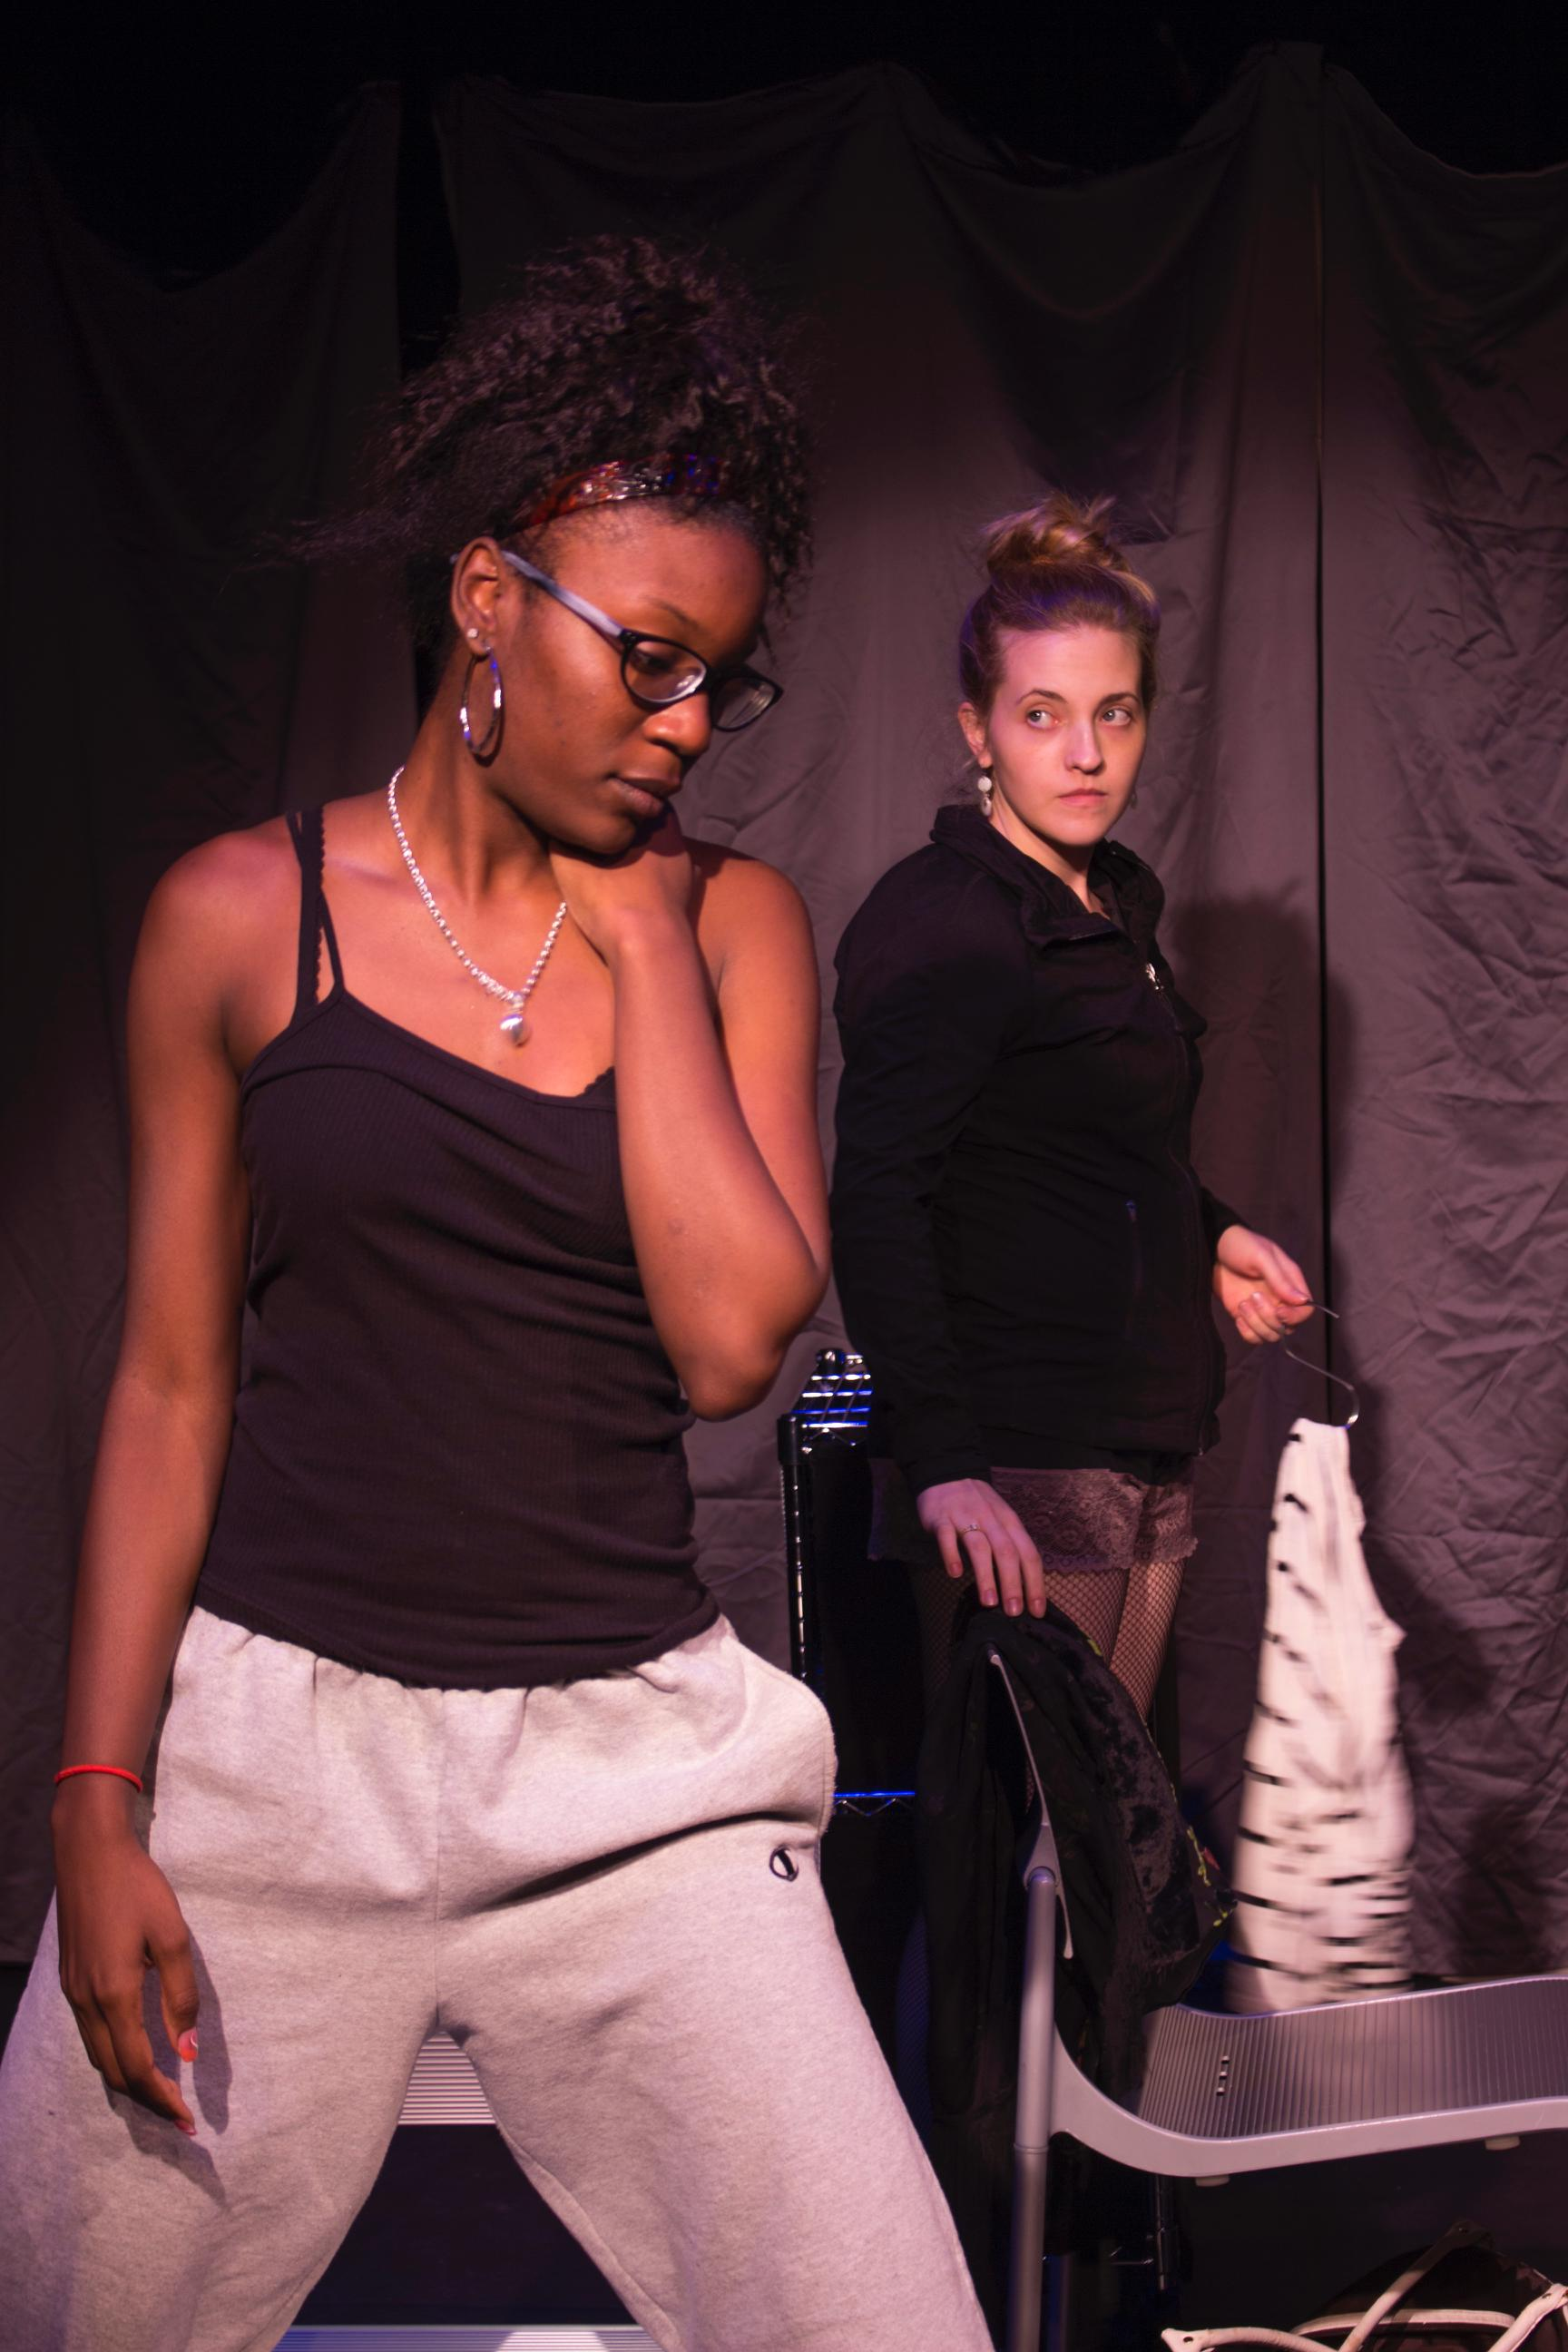 Paris Scott as VERONICA and Amanda Klinikowski as CANDY